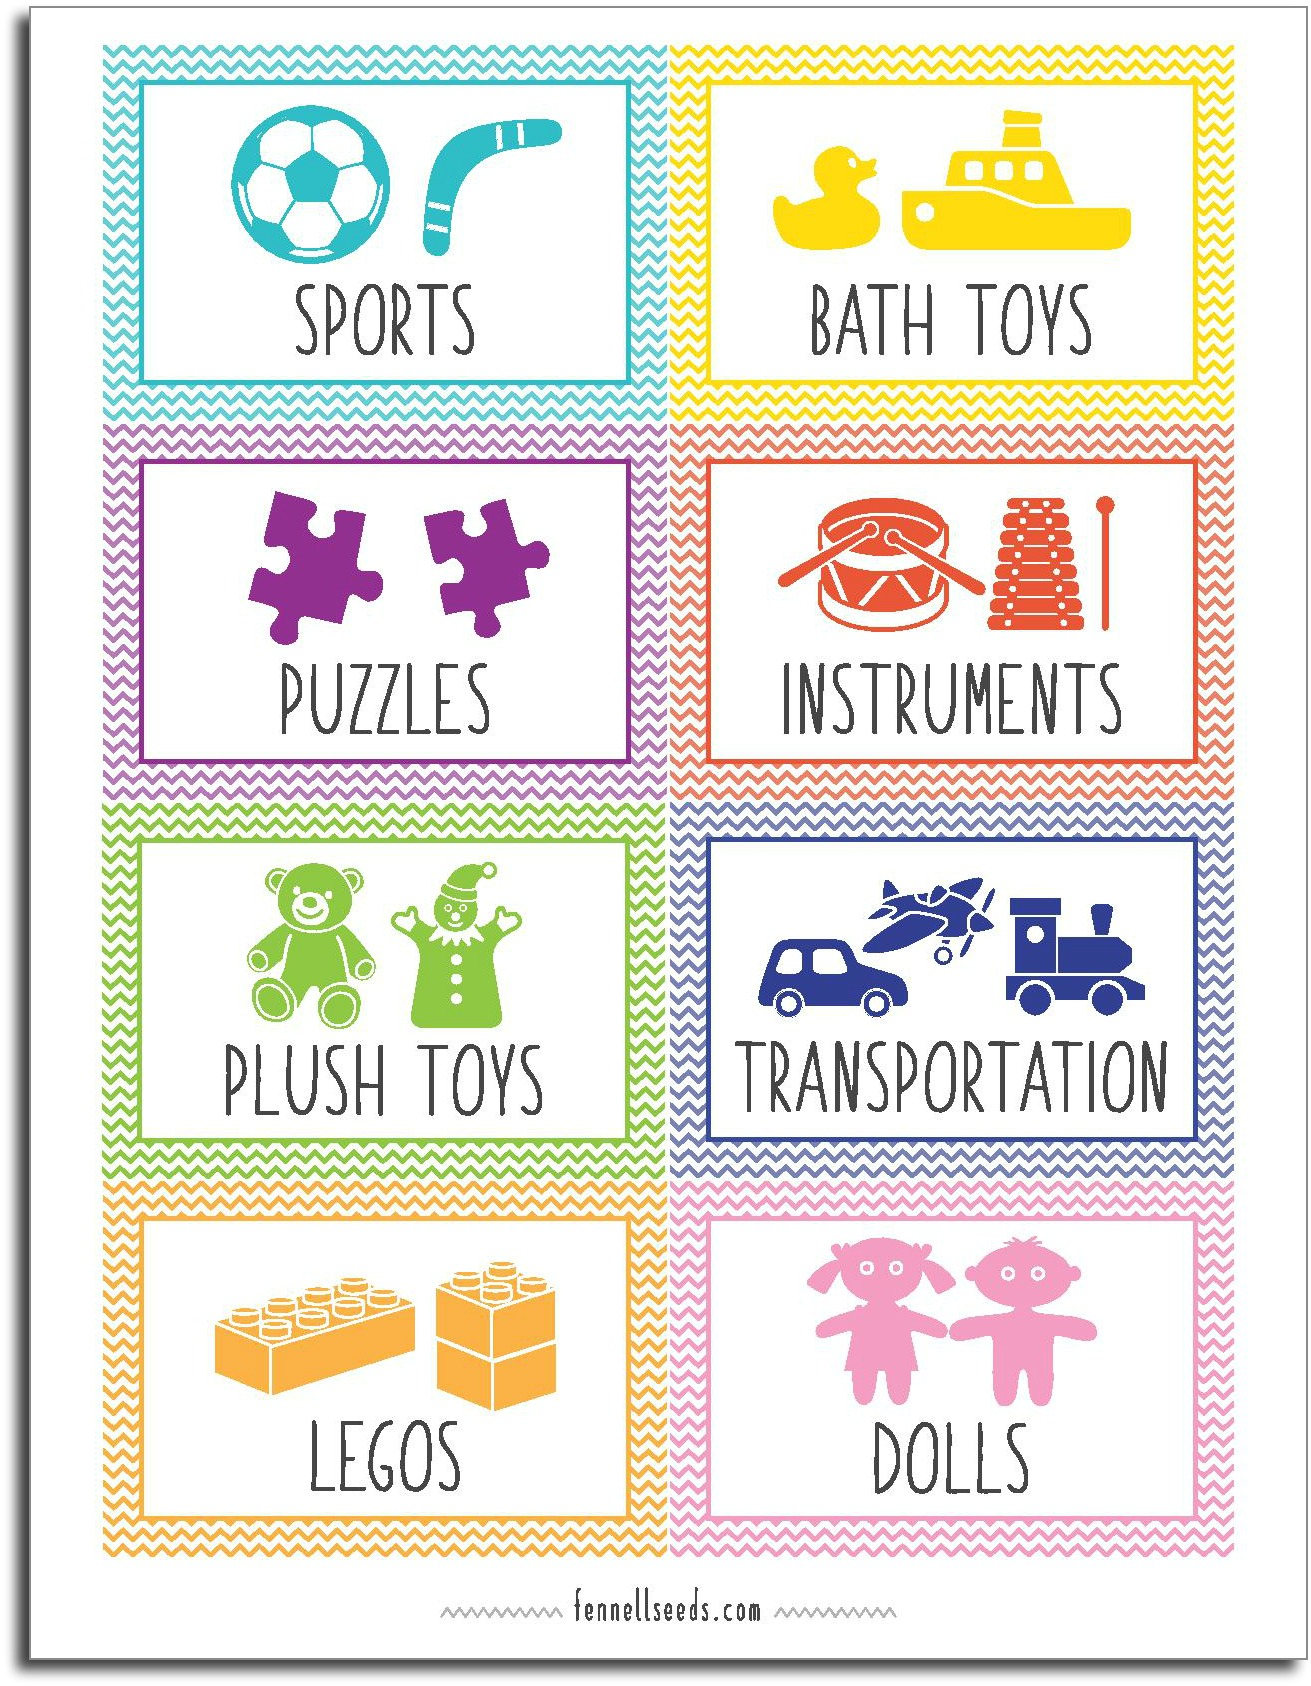 Amazon Organizer 8 Ridiculously Easy Toy Organization Hacks You Ll Wish You